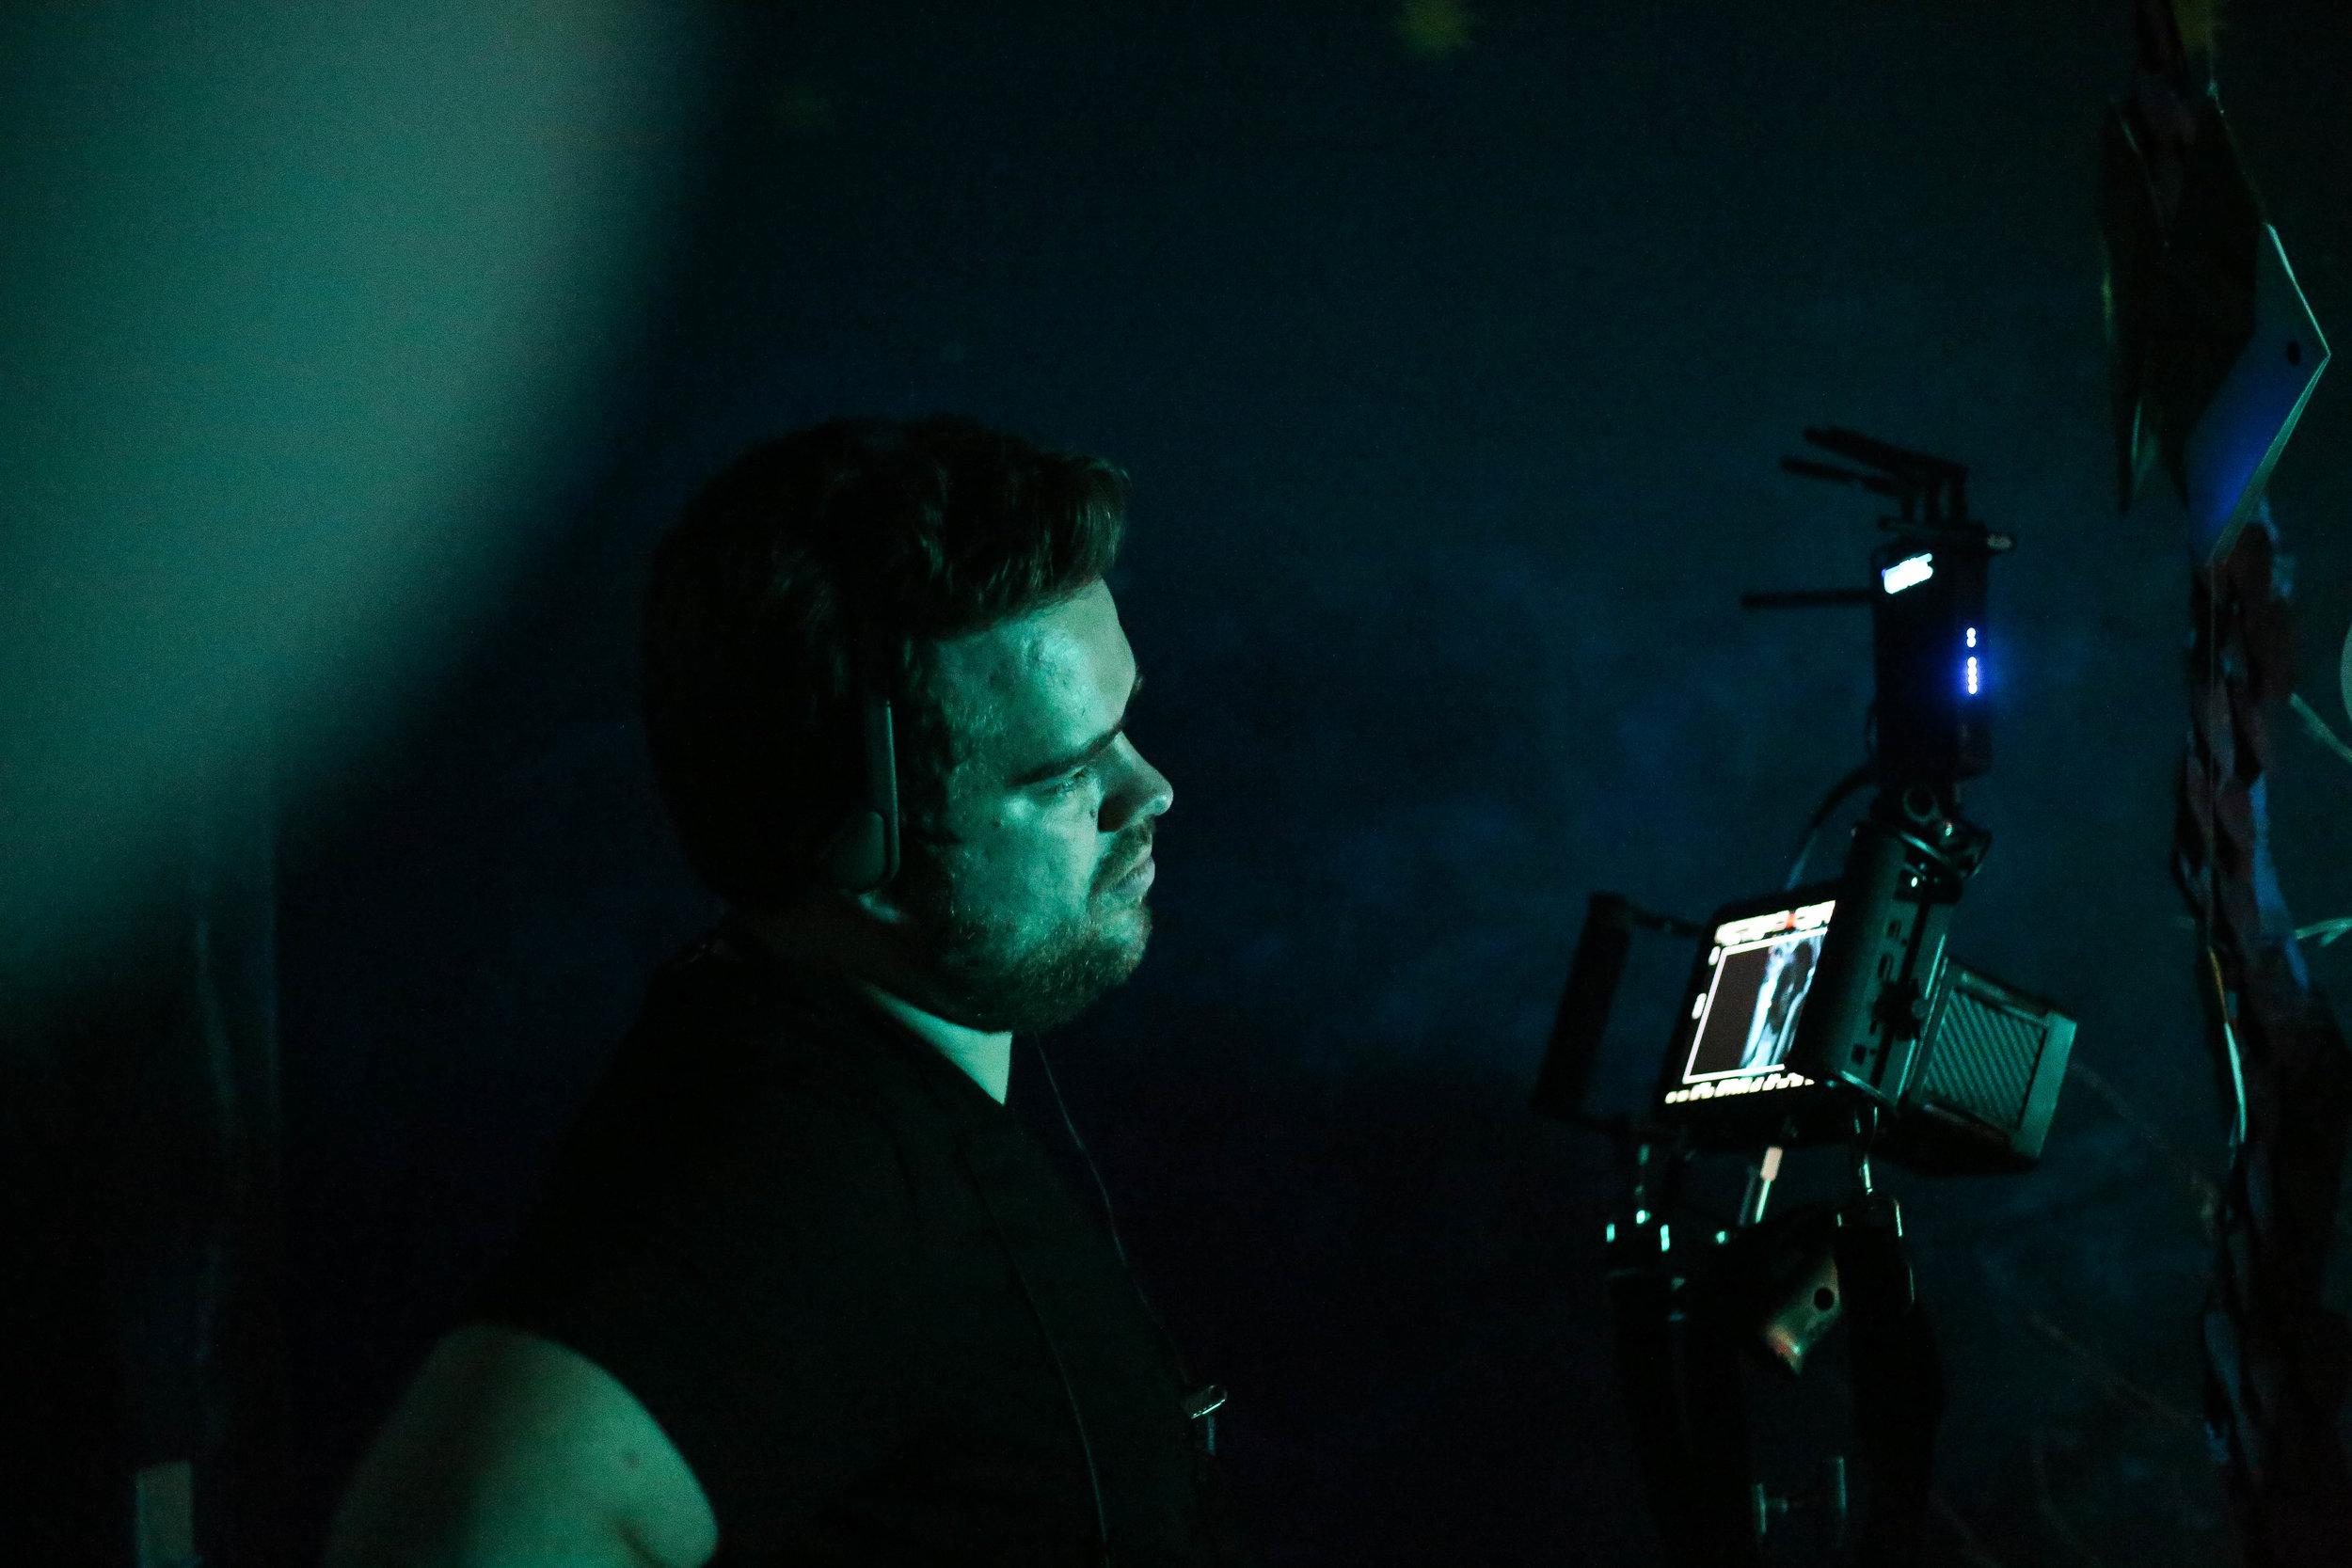 Producer Adam Bradshaw on set at Andromeda. Photo credit Di Wei.